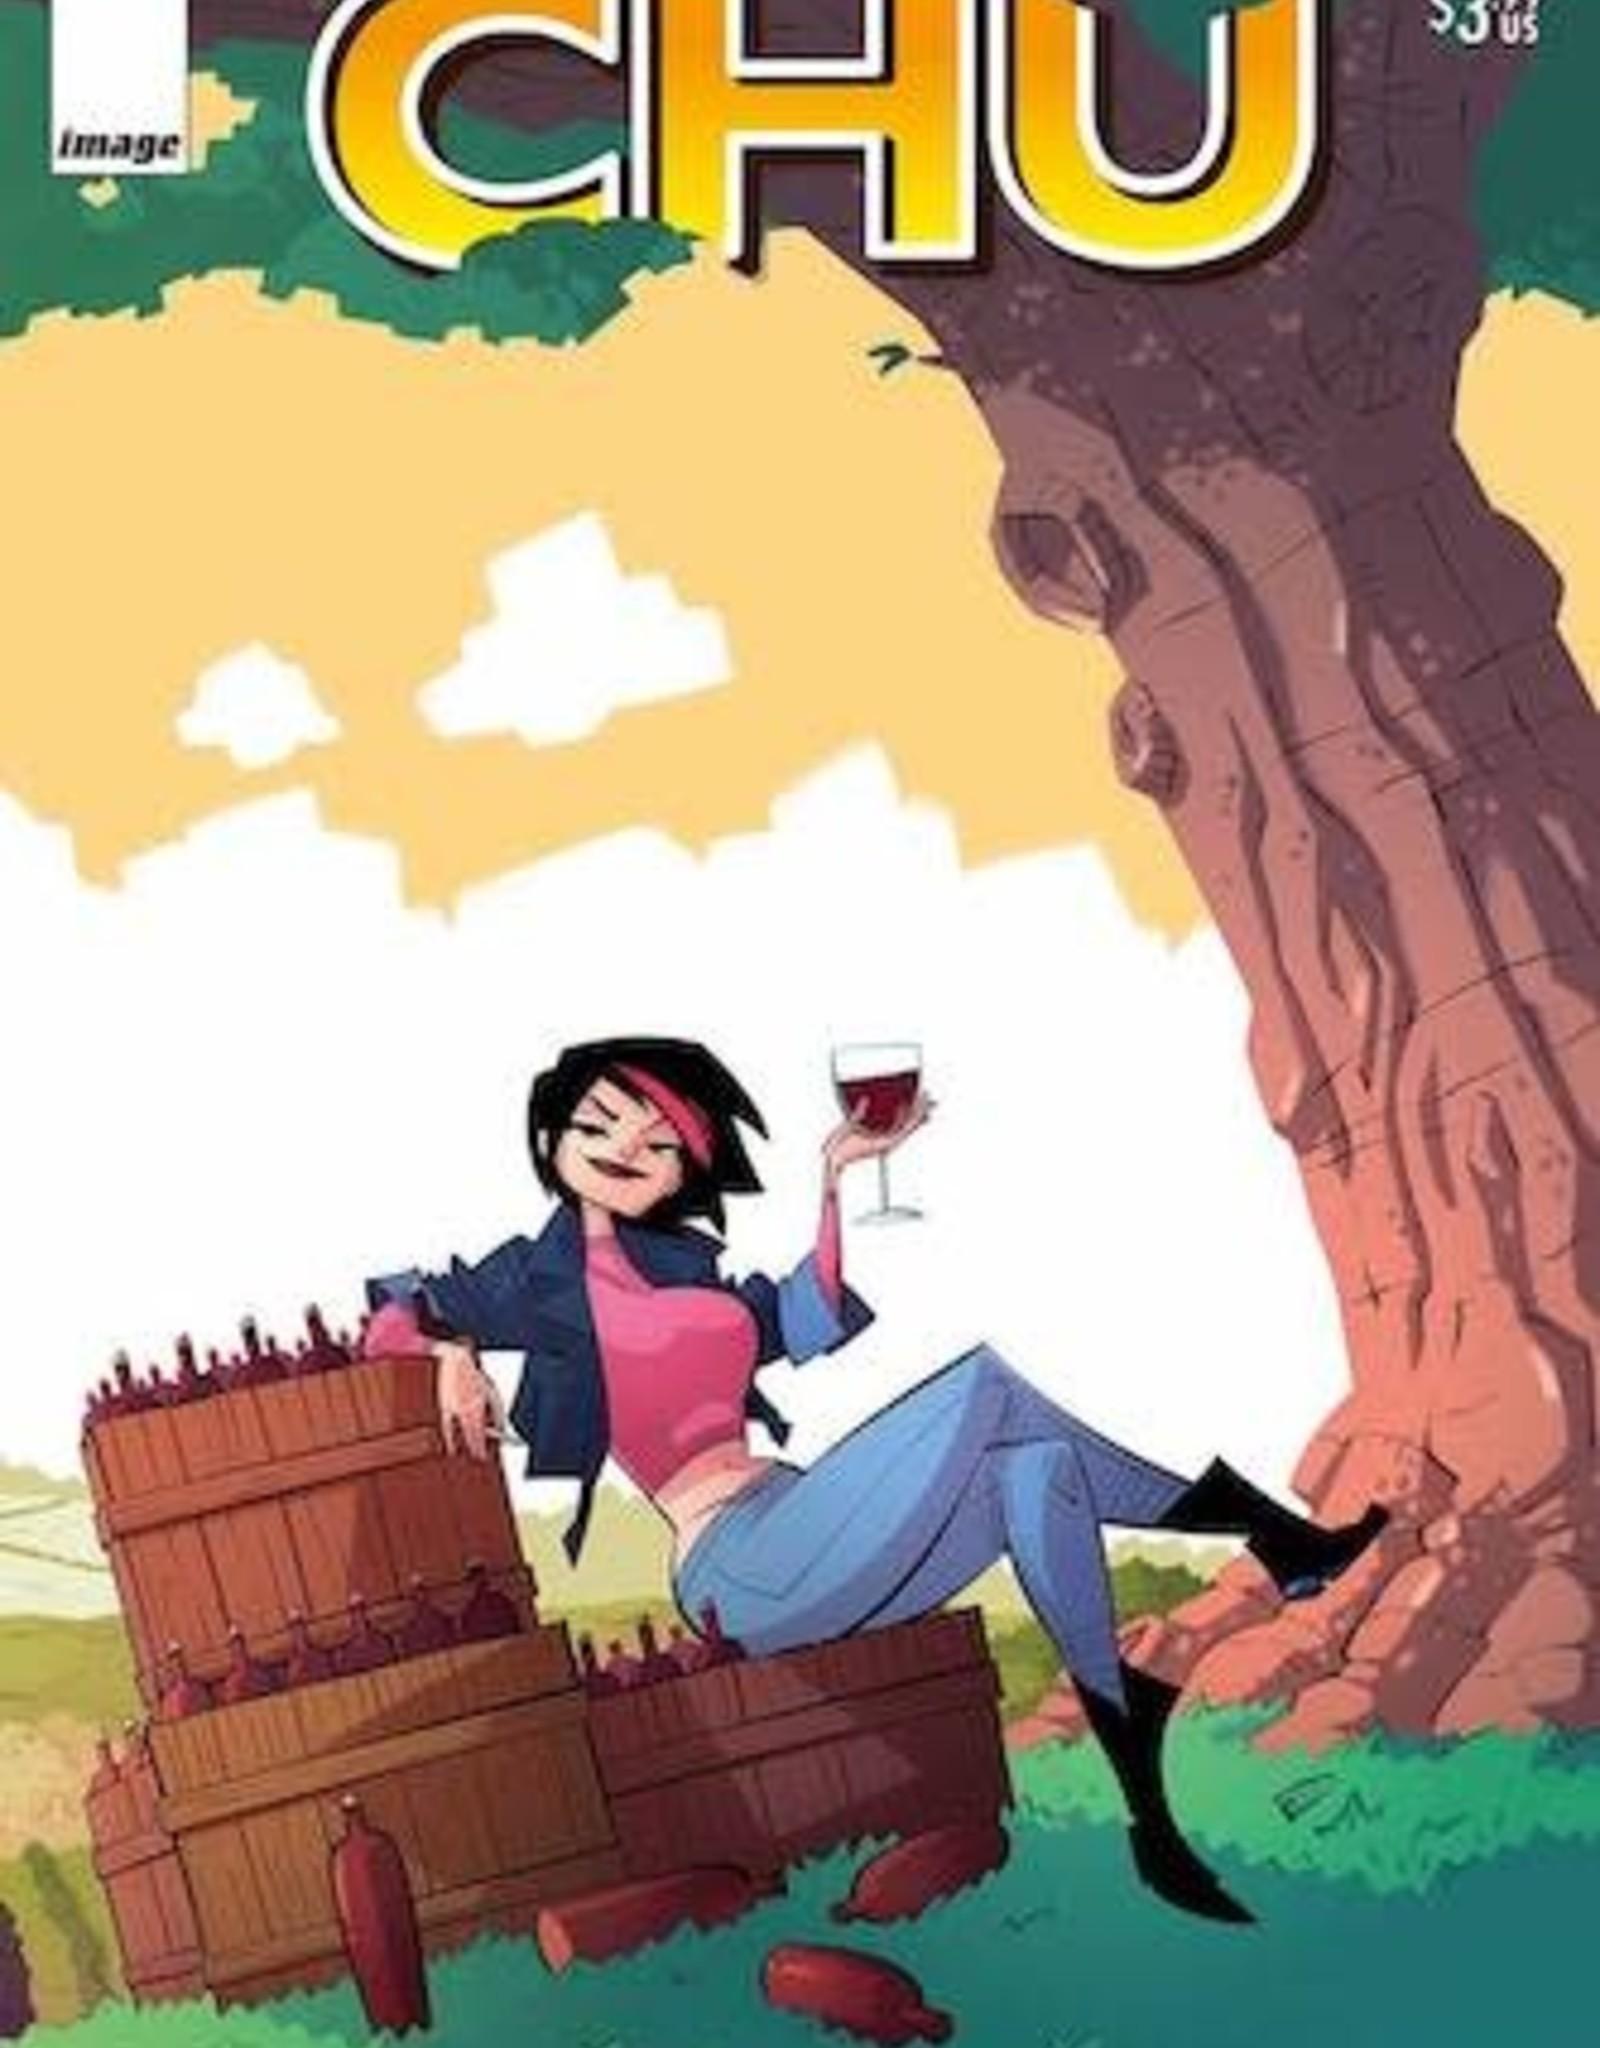 Image Comics Chu #6